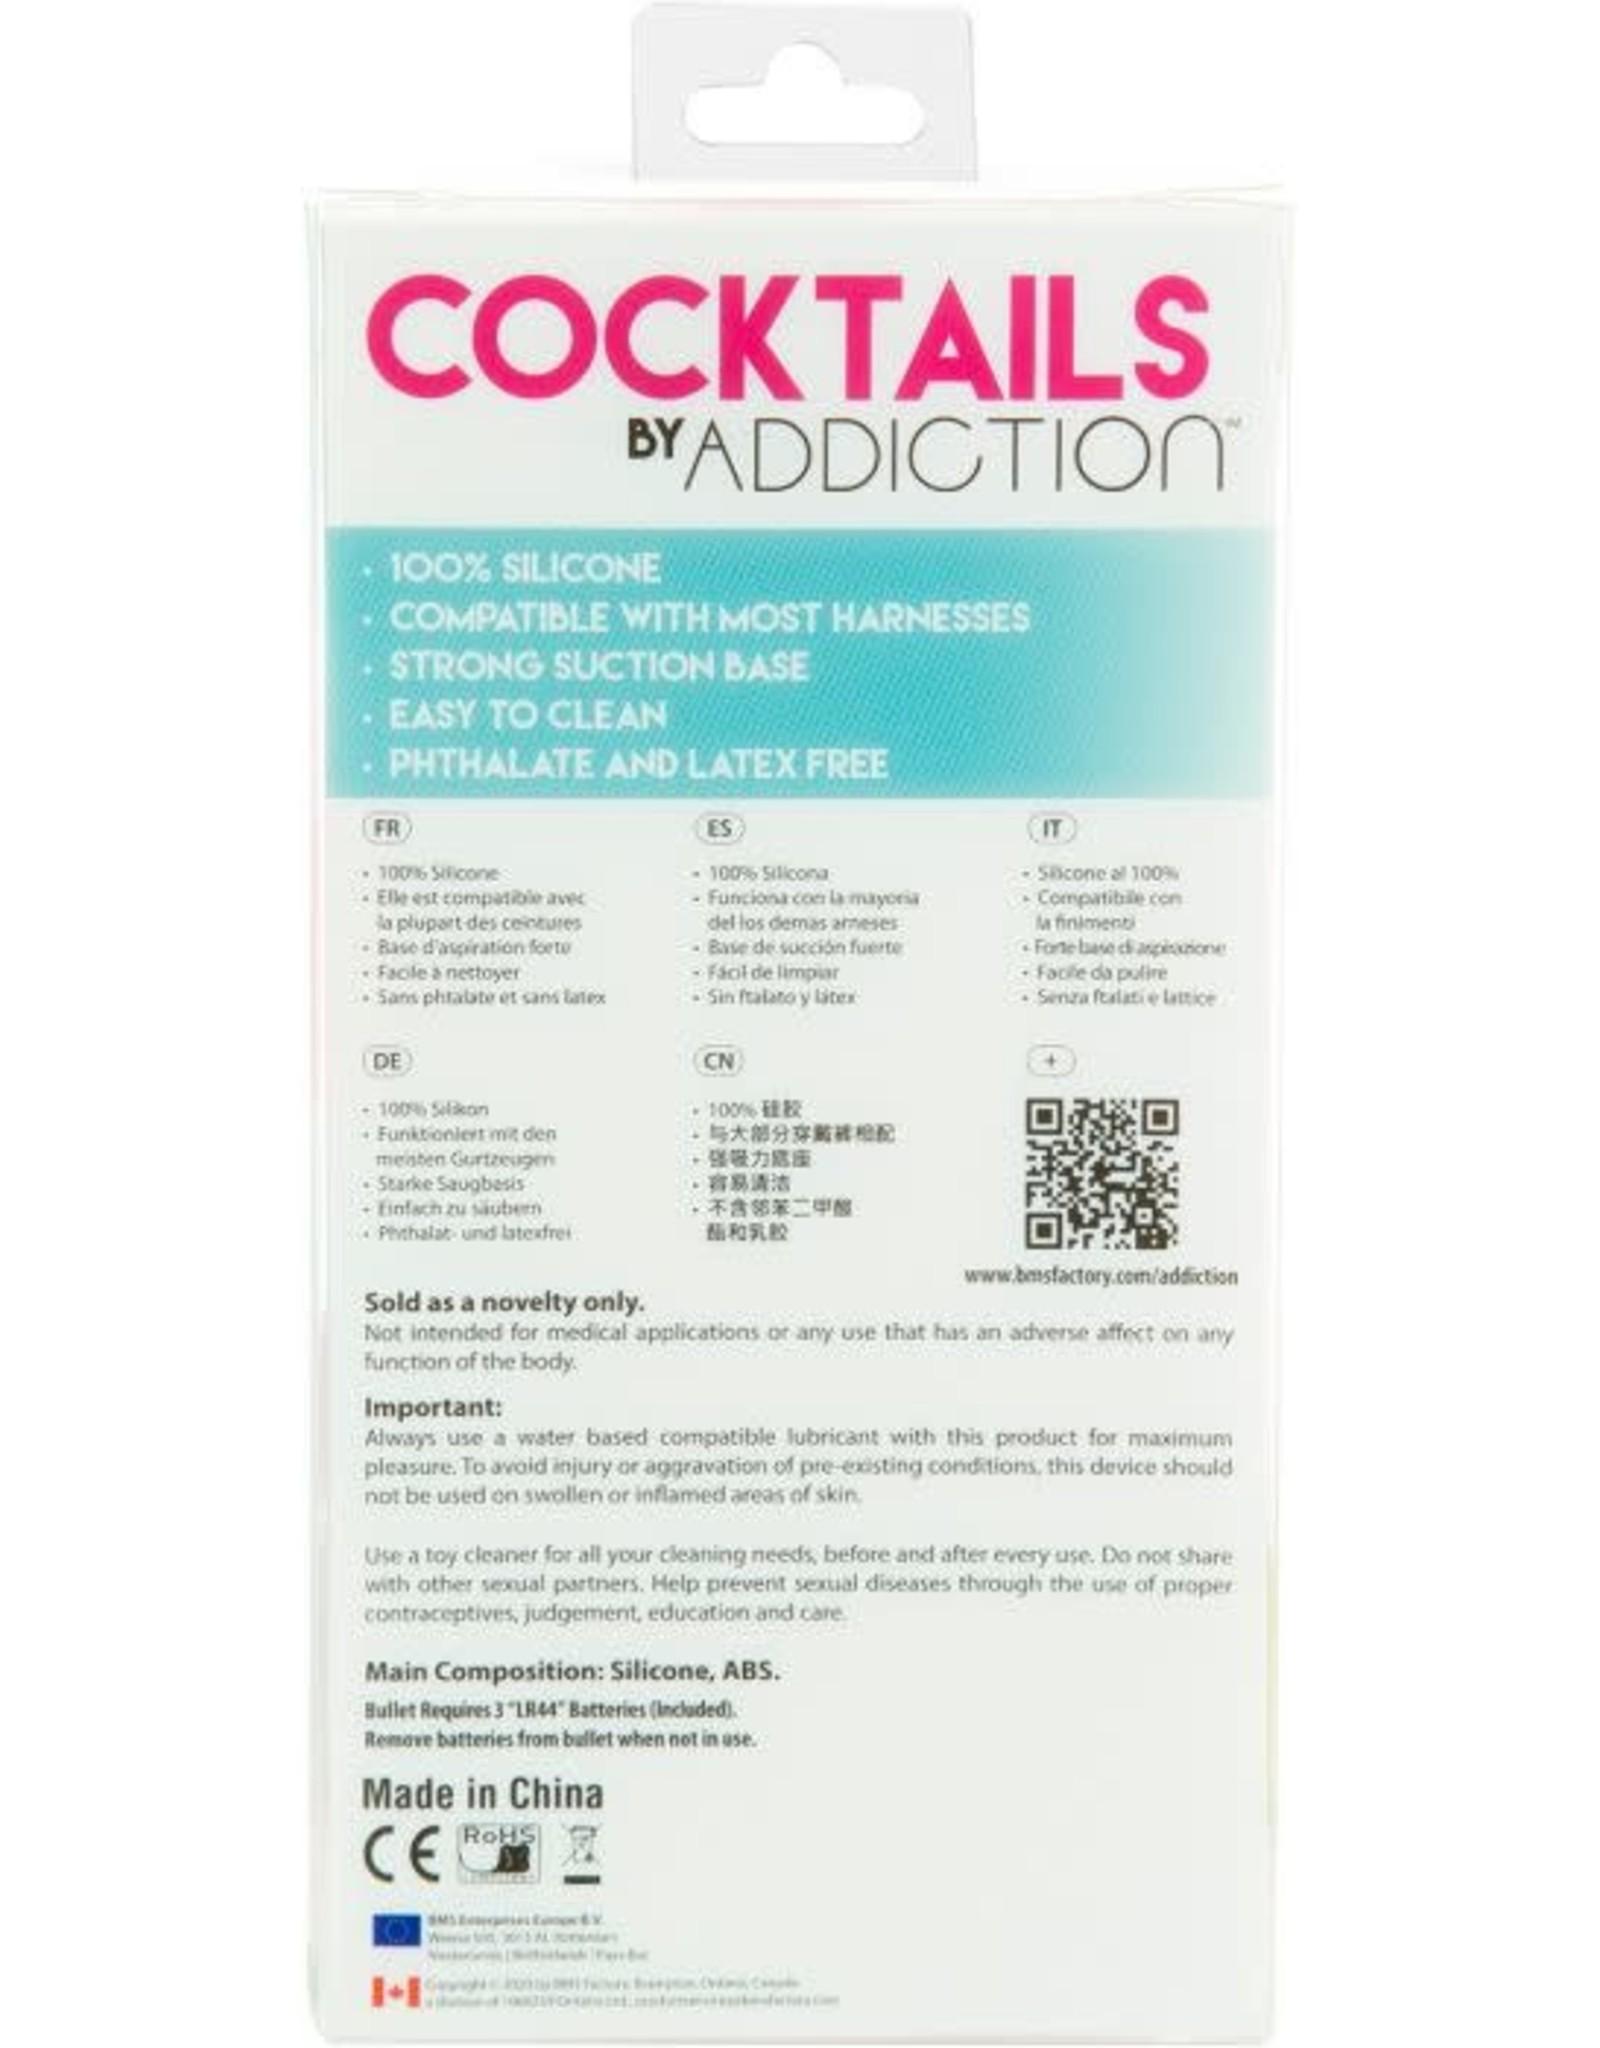 ADDICTION COCKTAILS BY ADDICTION - BLUE LAGOON